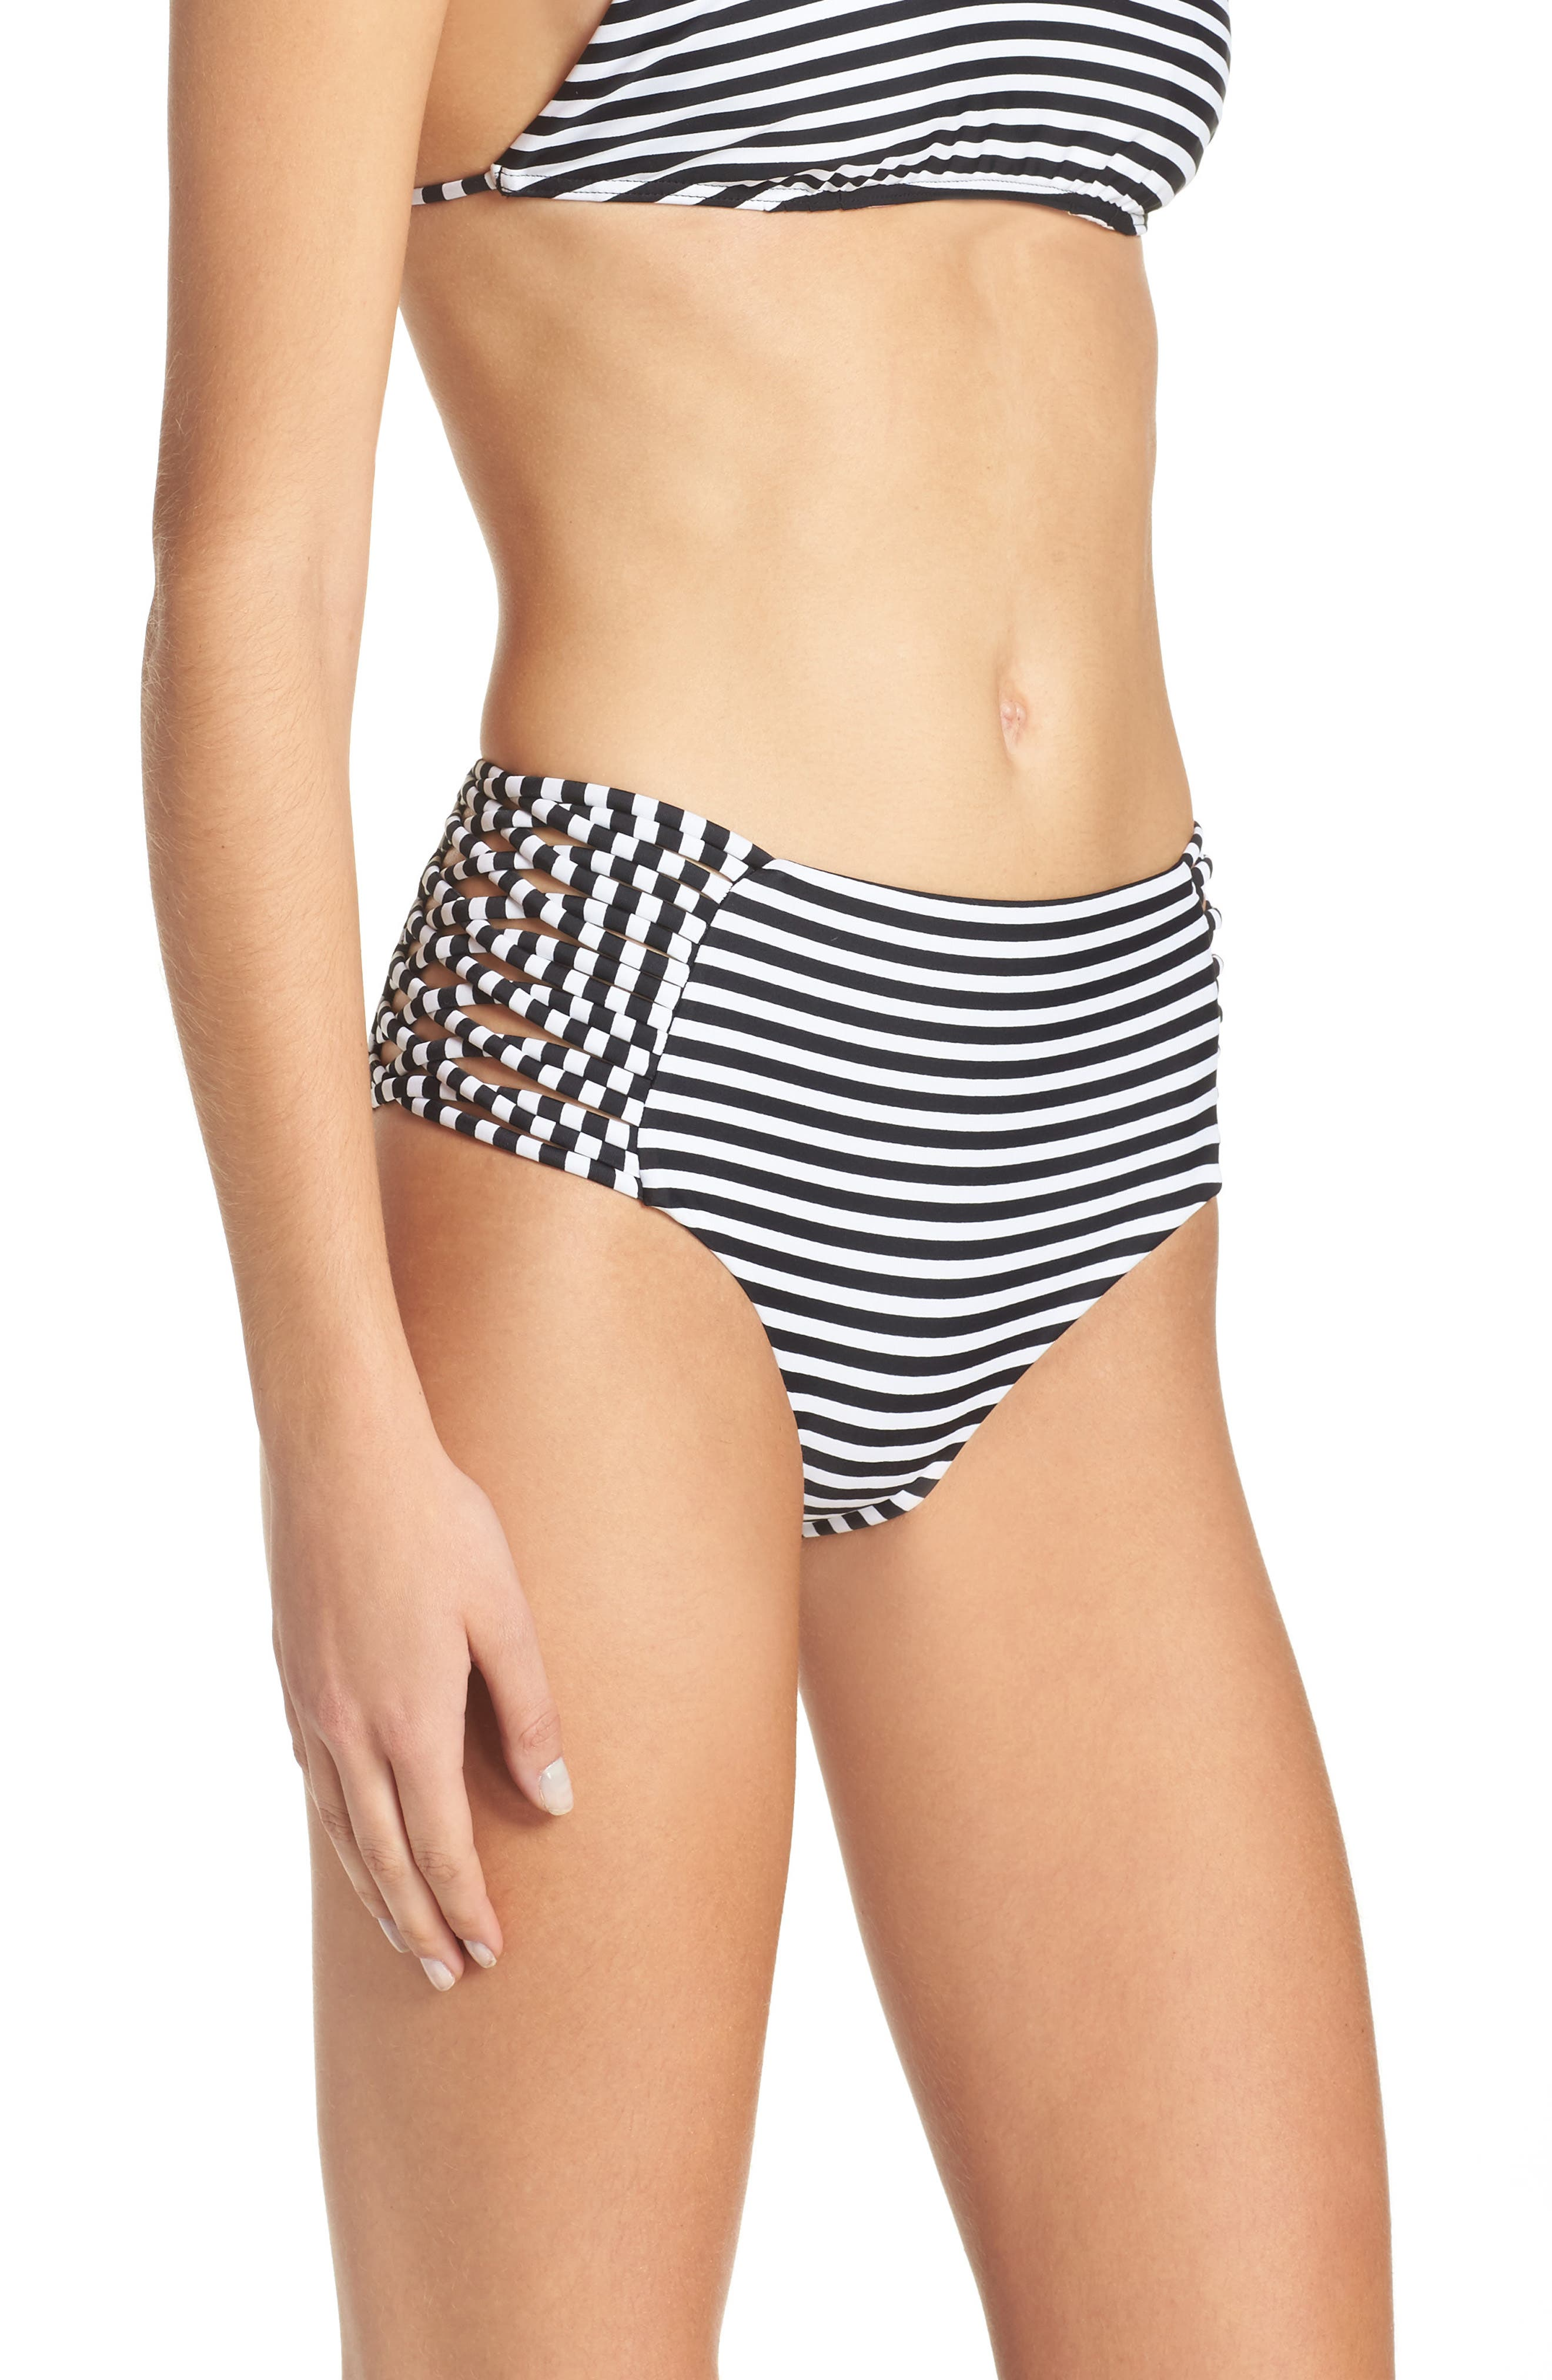 Alternate Image 3  - Byrds of Paradise Morrissey High Waist Bikini Bottoms